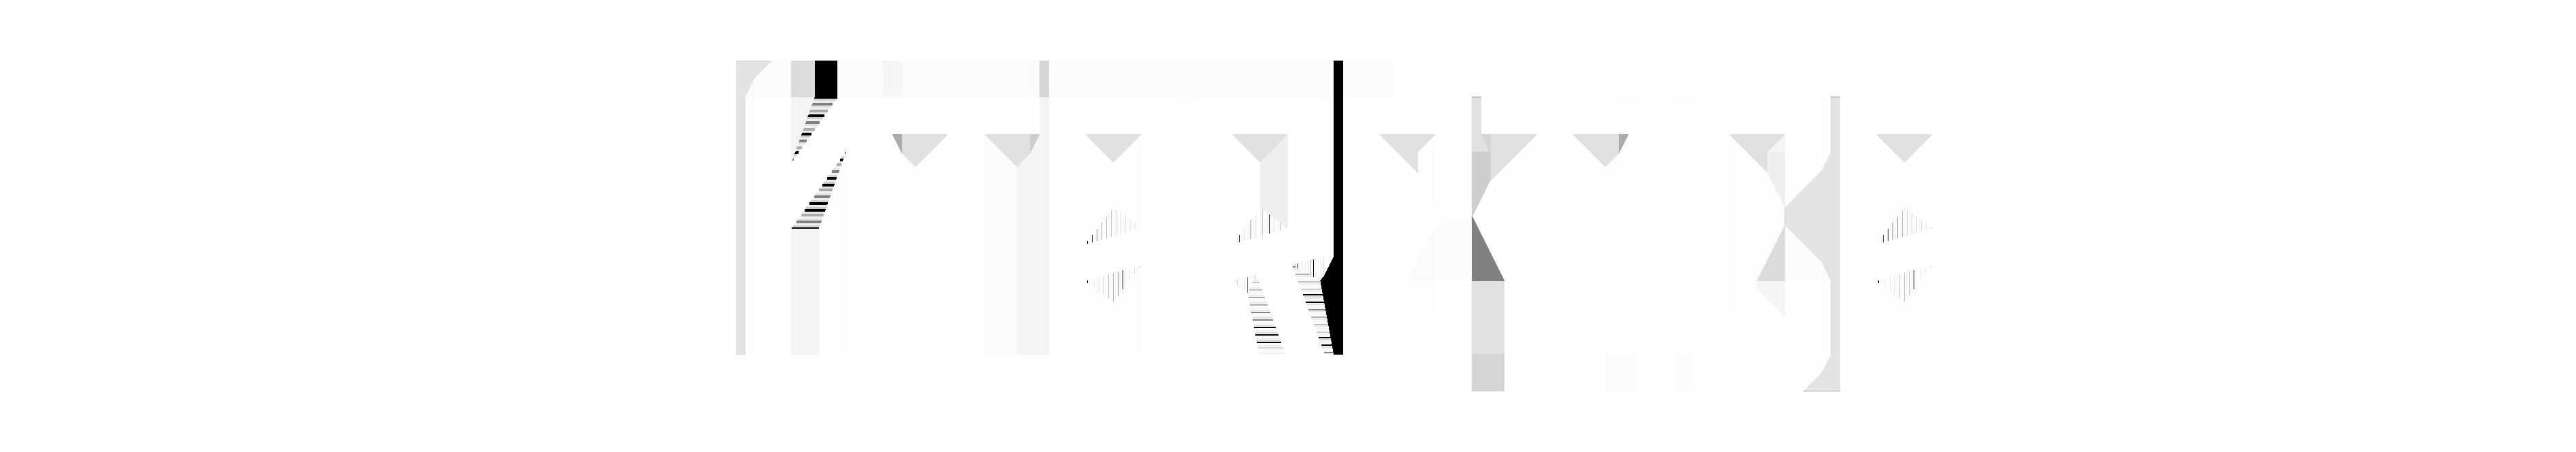 Untarctica (Demo)